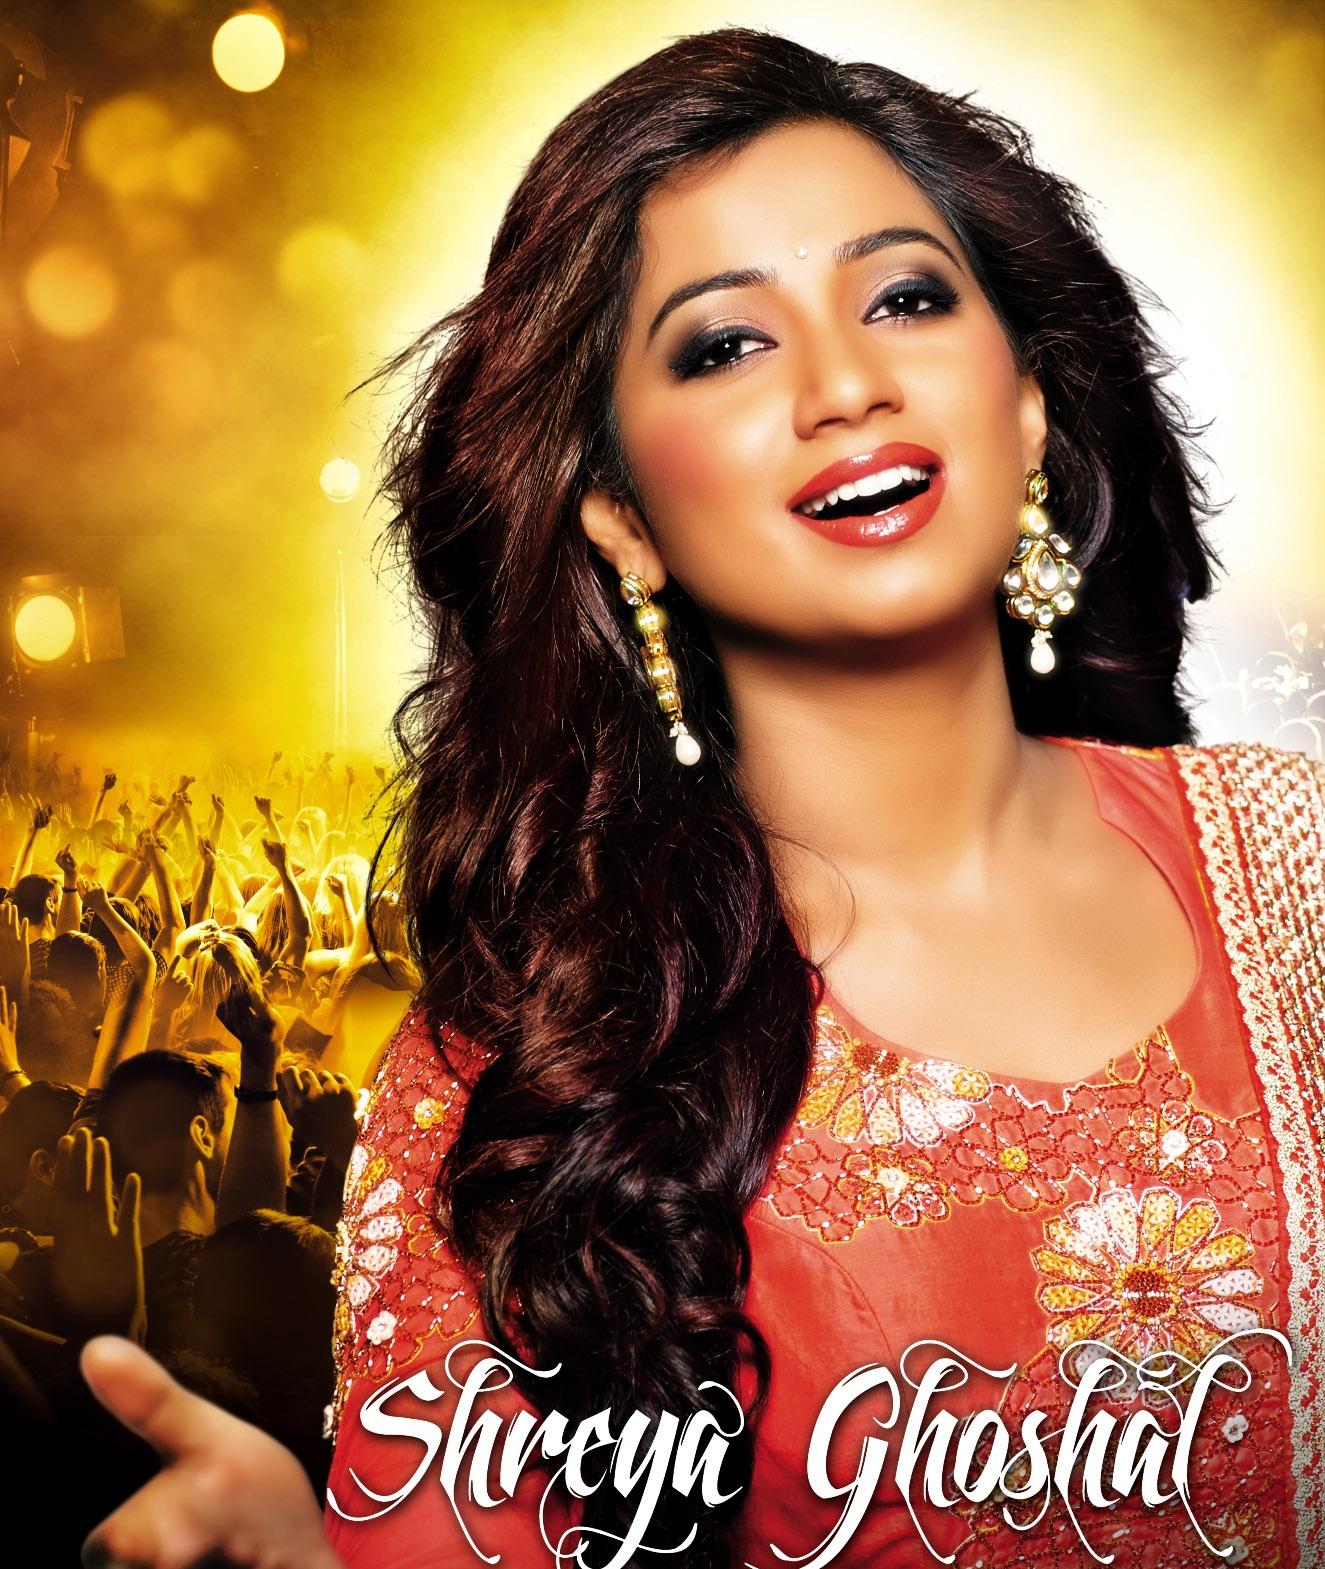 Shreya Ghoshal Images Hd Wallpaper All 4u Wallpaper